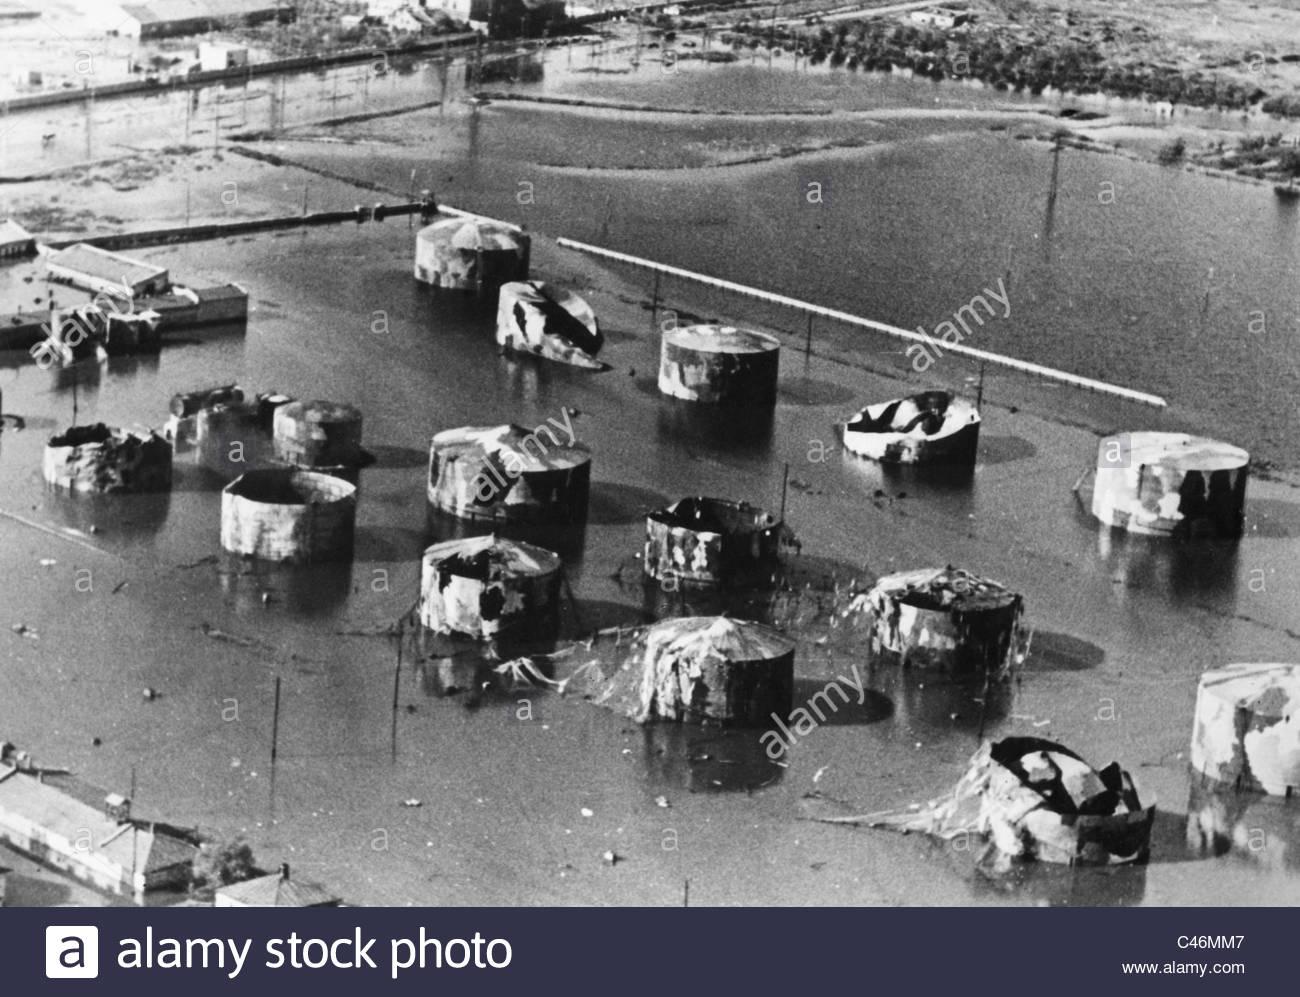 seconde-guerre-mondiale-siege-dodessa-1941-c46mm7